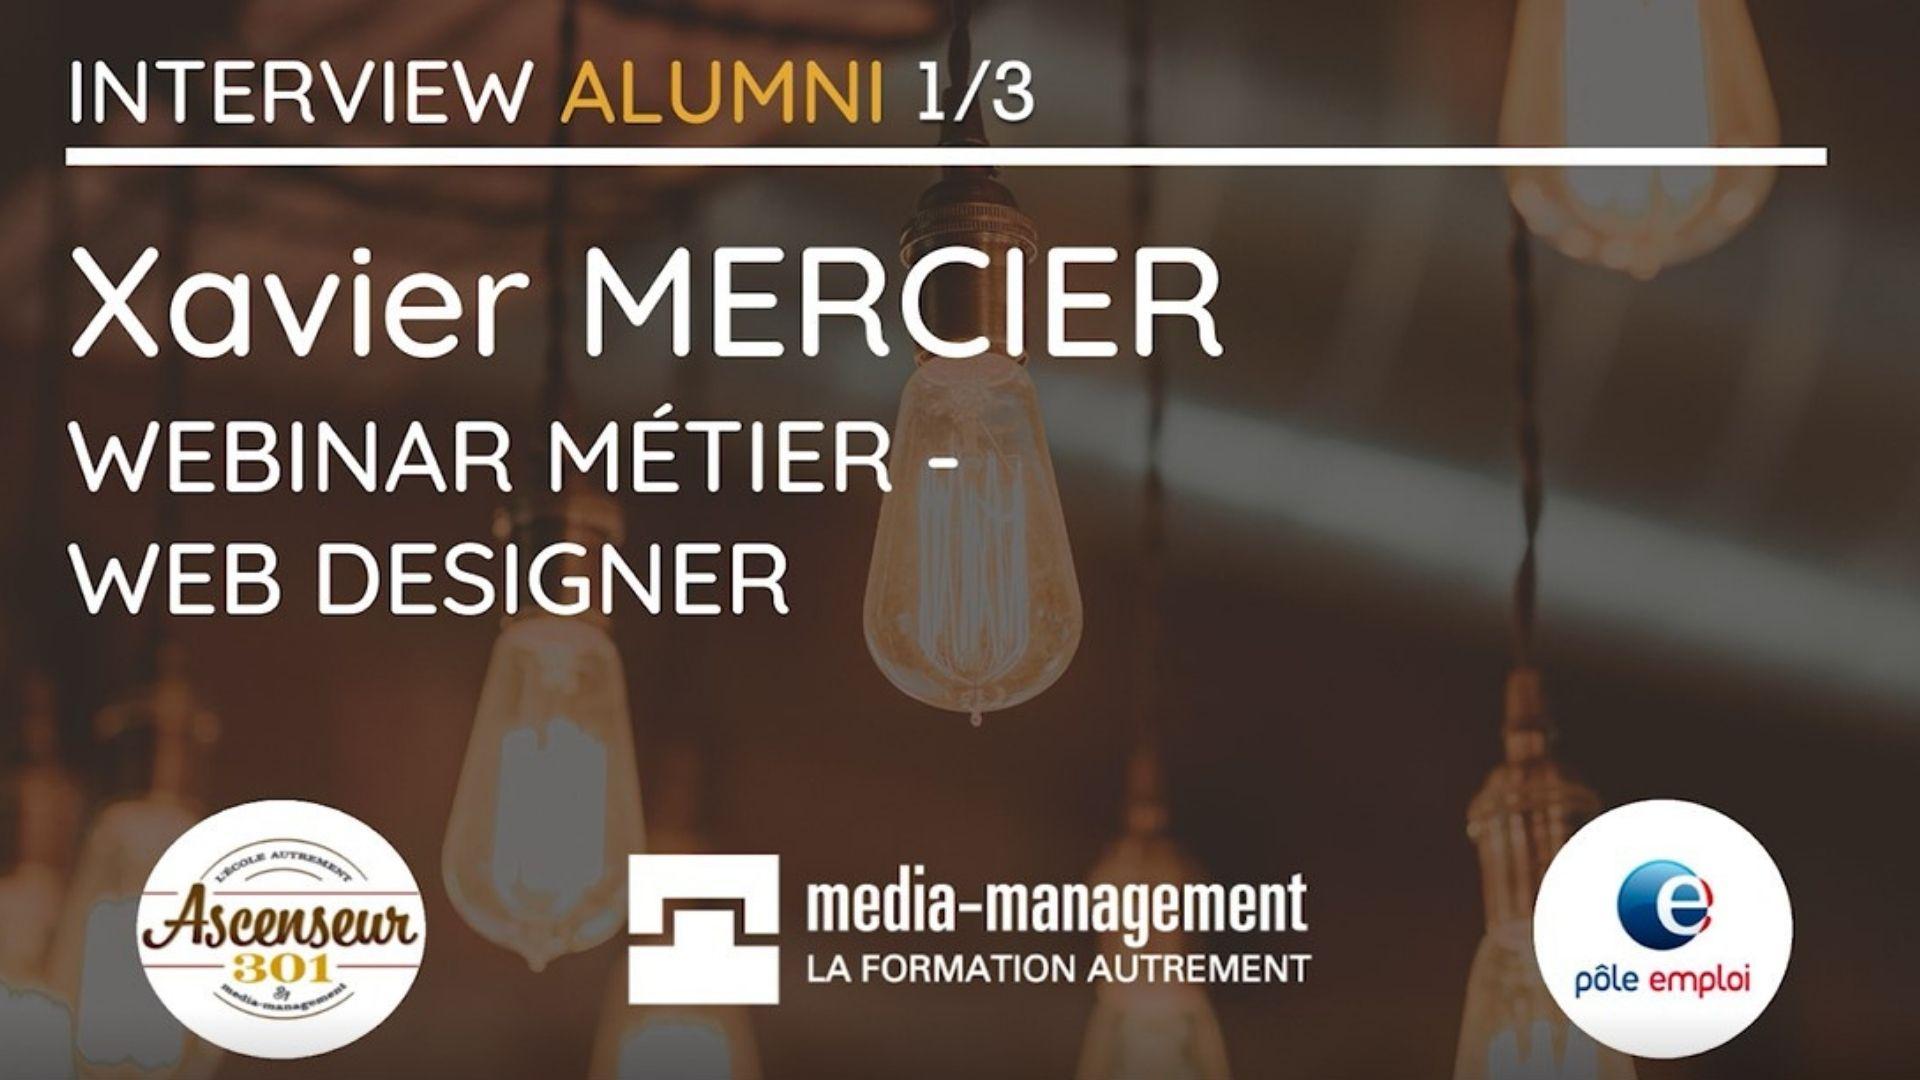 comment devenir web designer ? webinar métier épisode 1